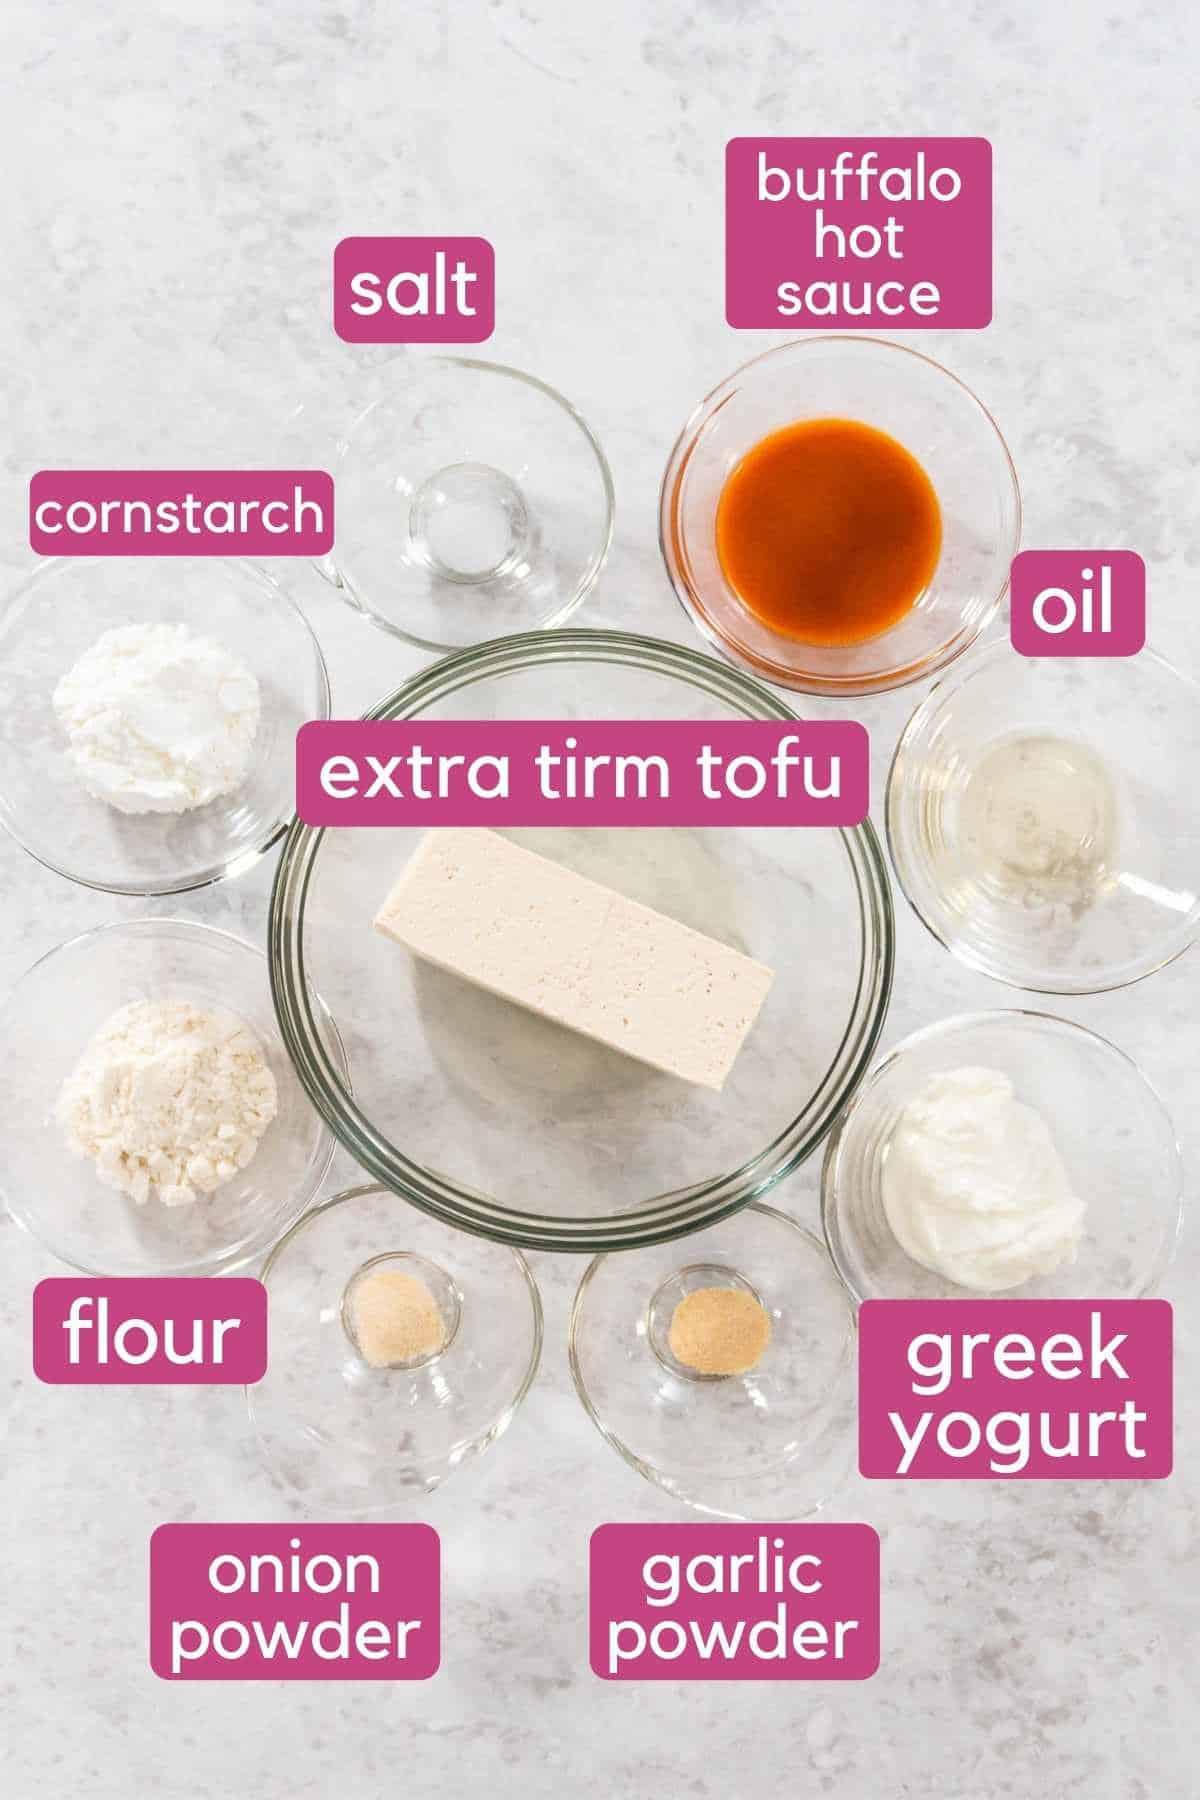 buffalo tofu ingredients on the counter.